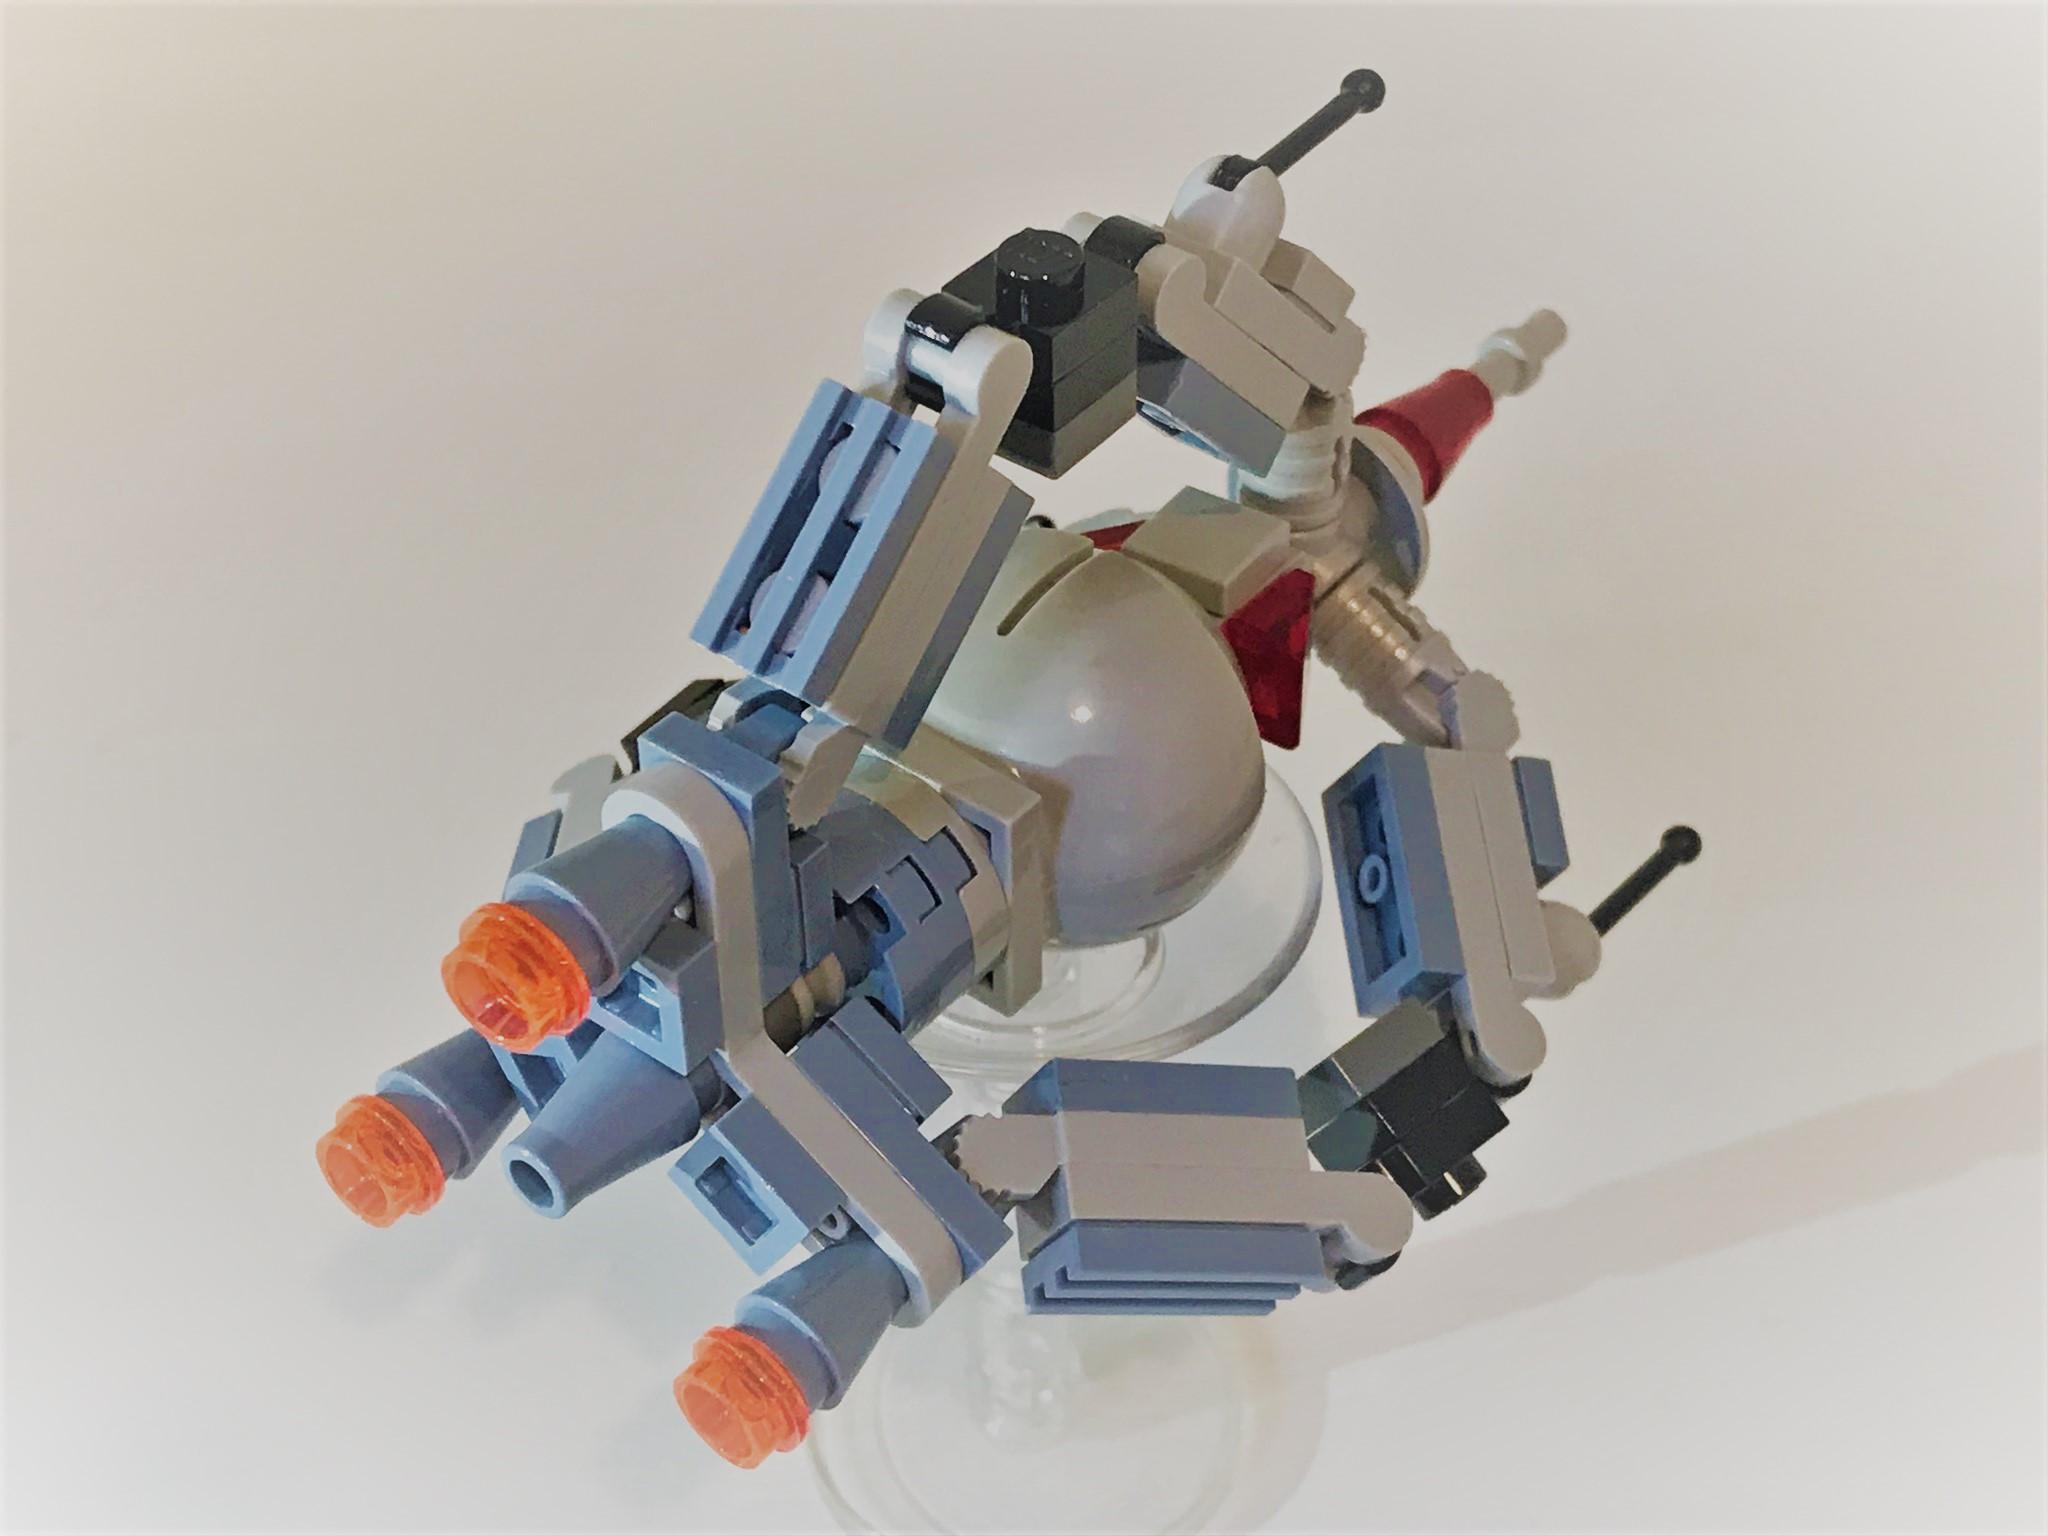 Droidtrifighter6.JPEG